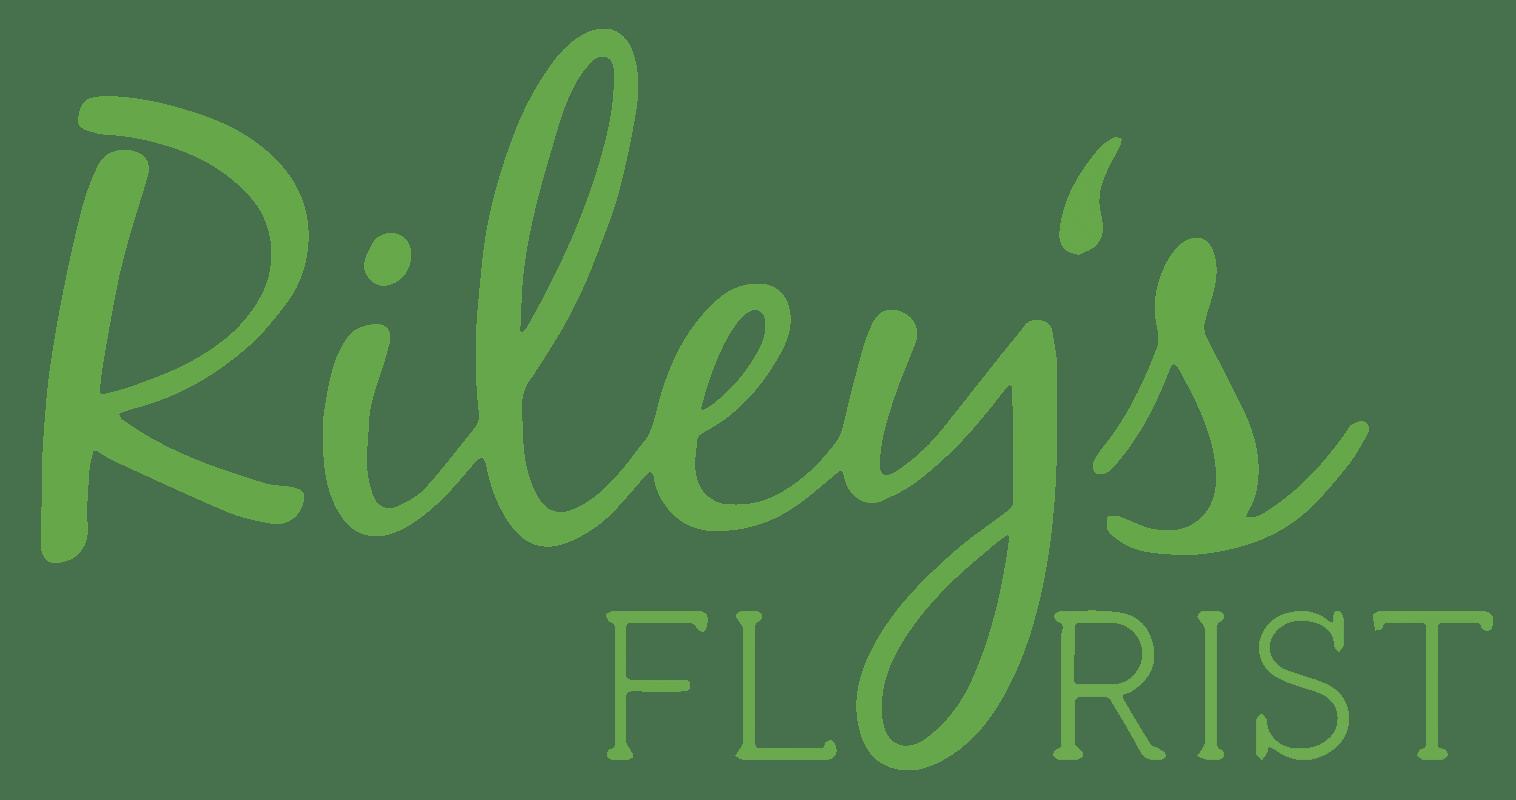 St Louis Florist | Flower Delivery by Rileys Florist